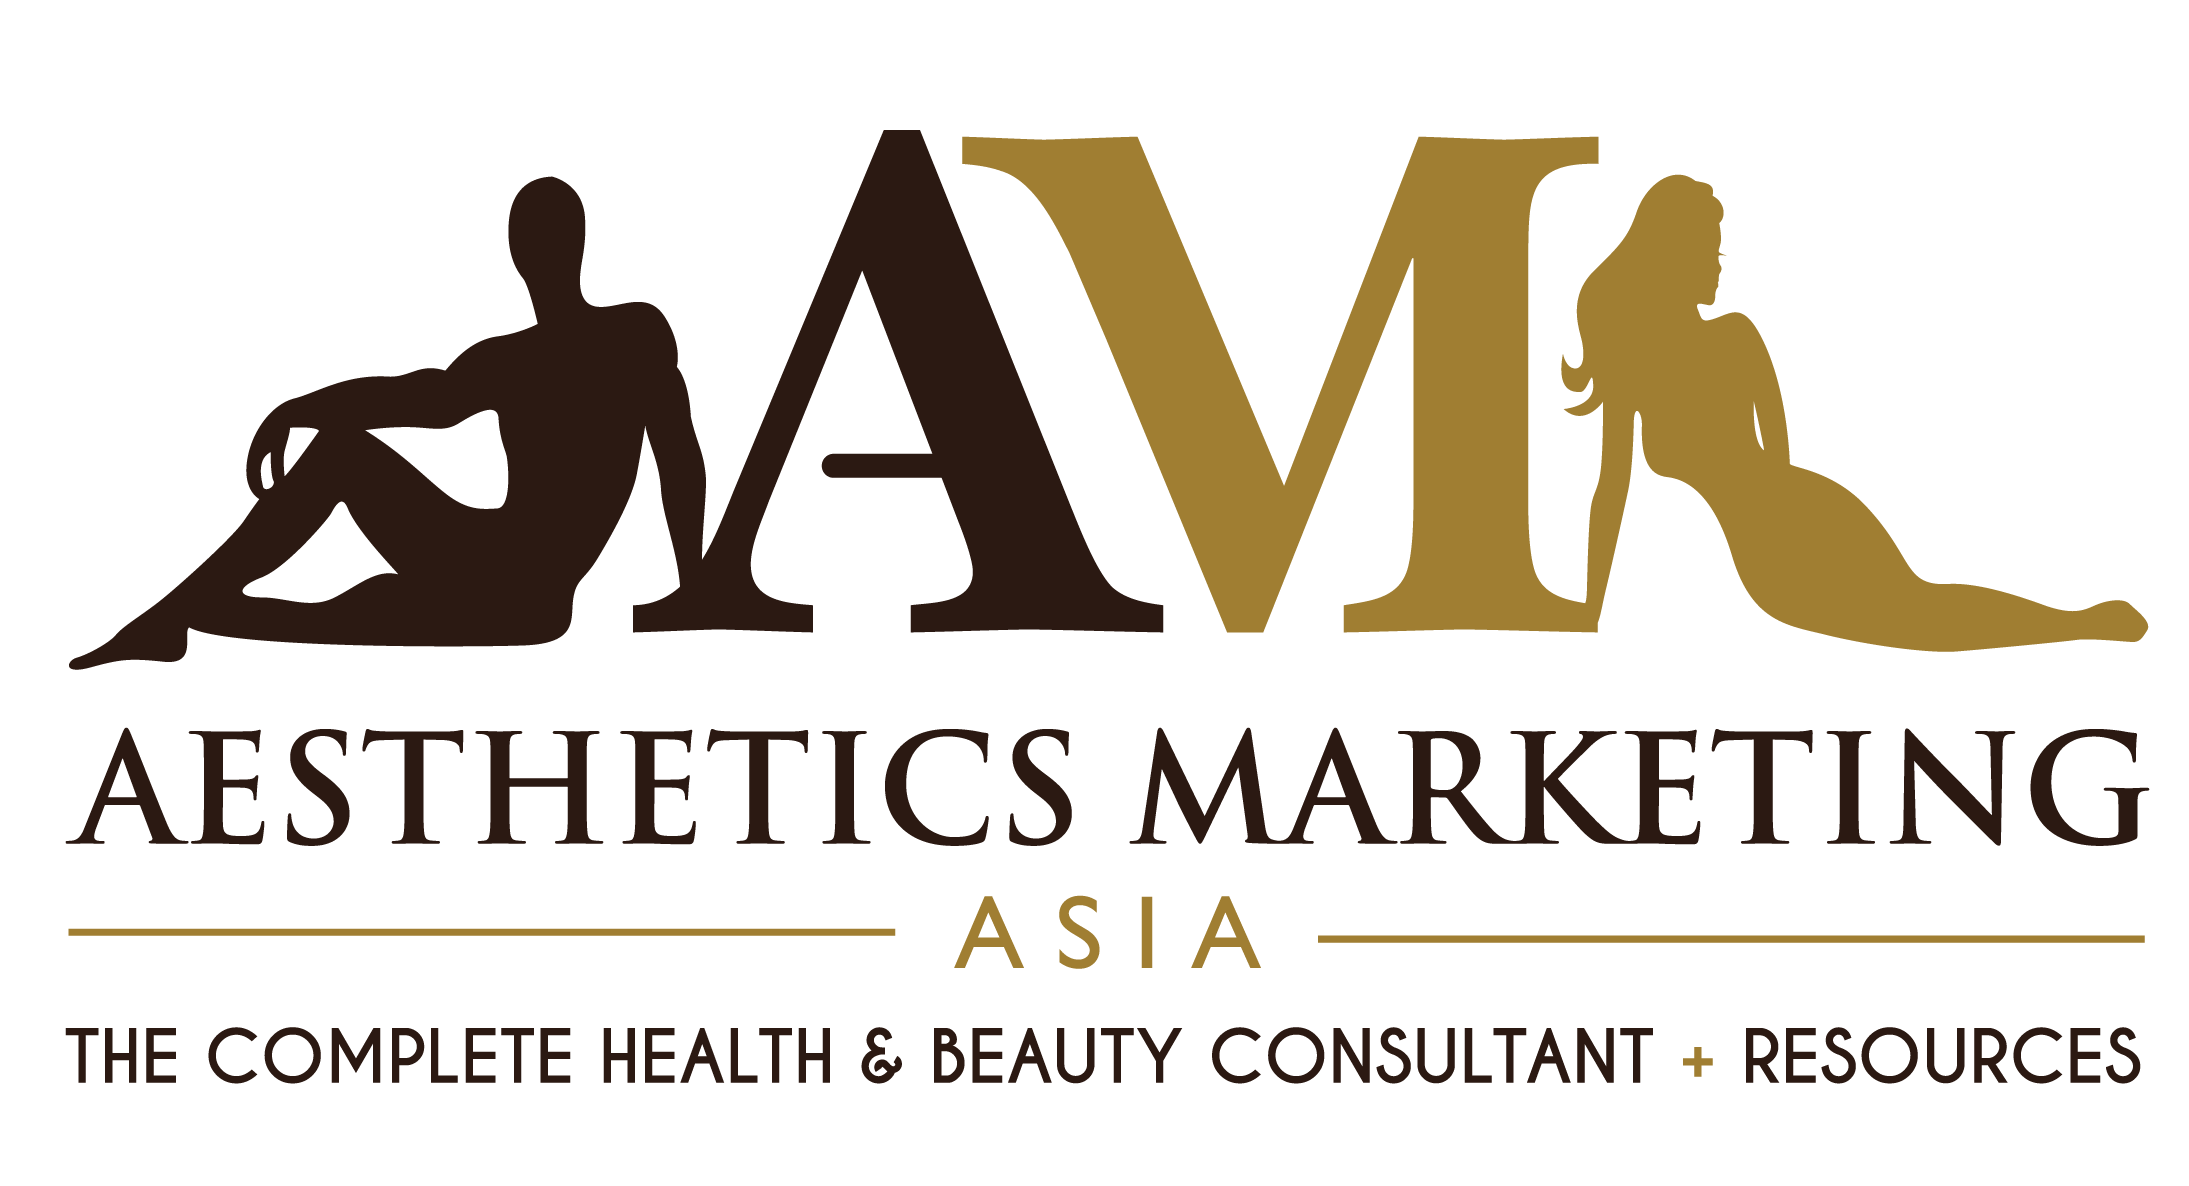 Aesthetics Marketing Asia Pte Ltd